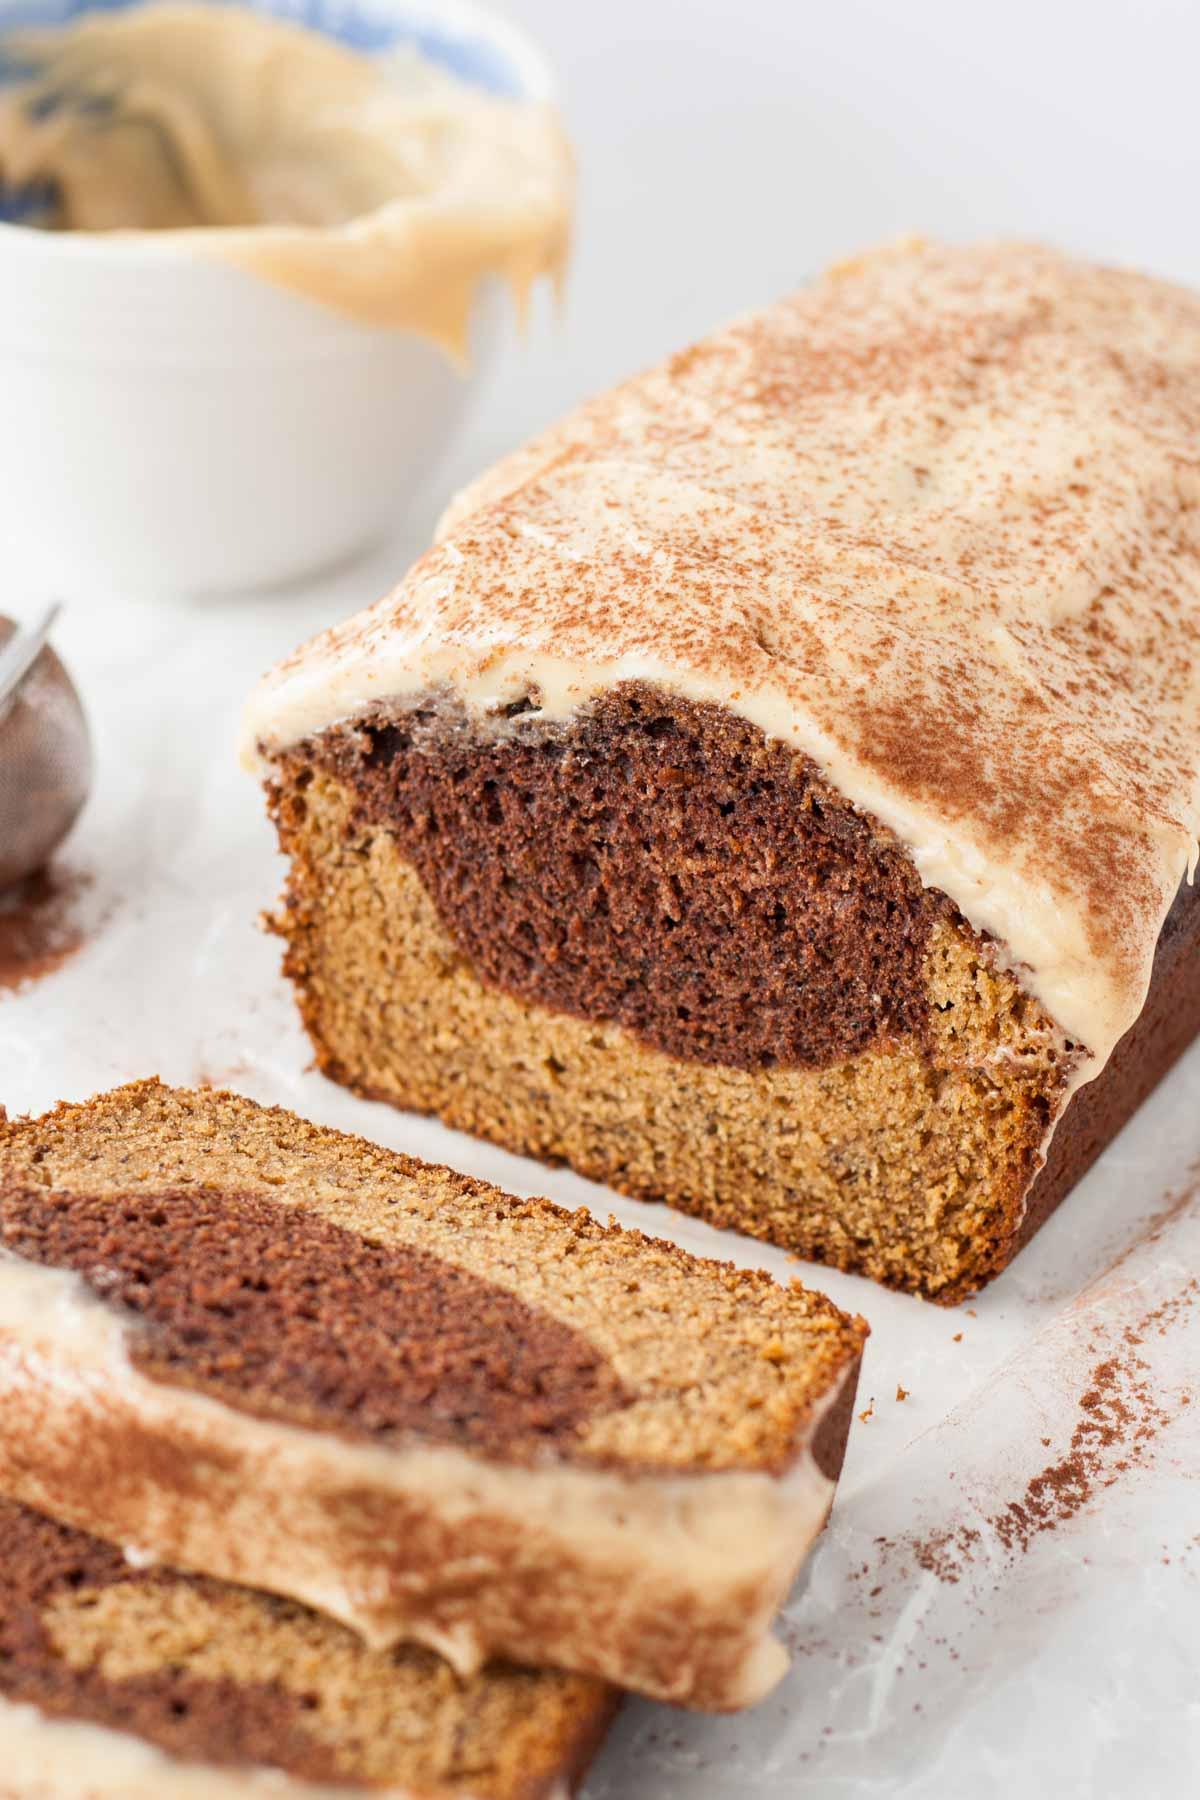 Angled shot of the slices loaf.